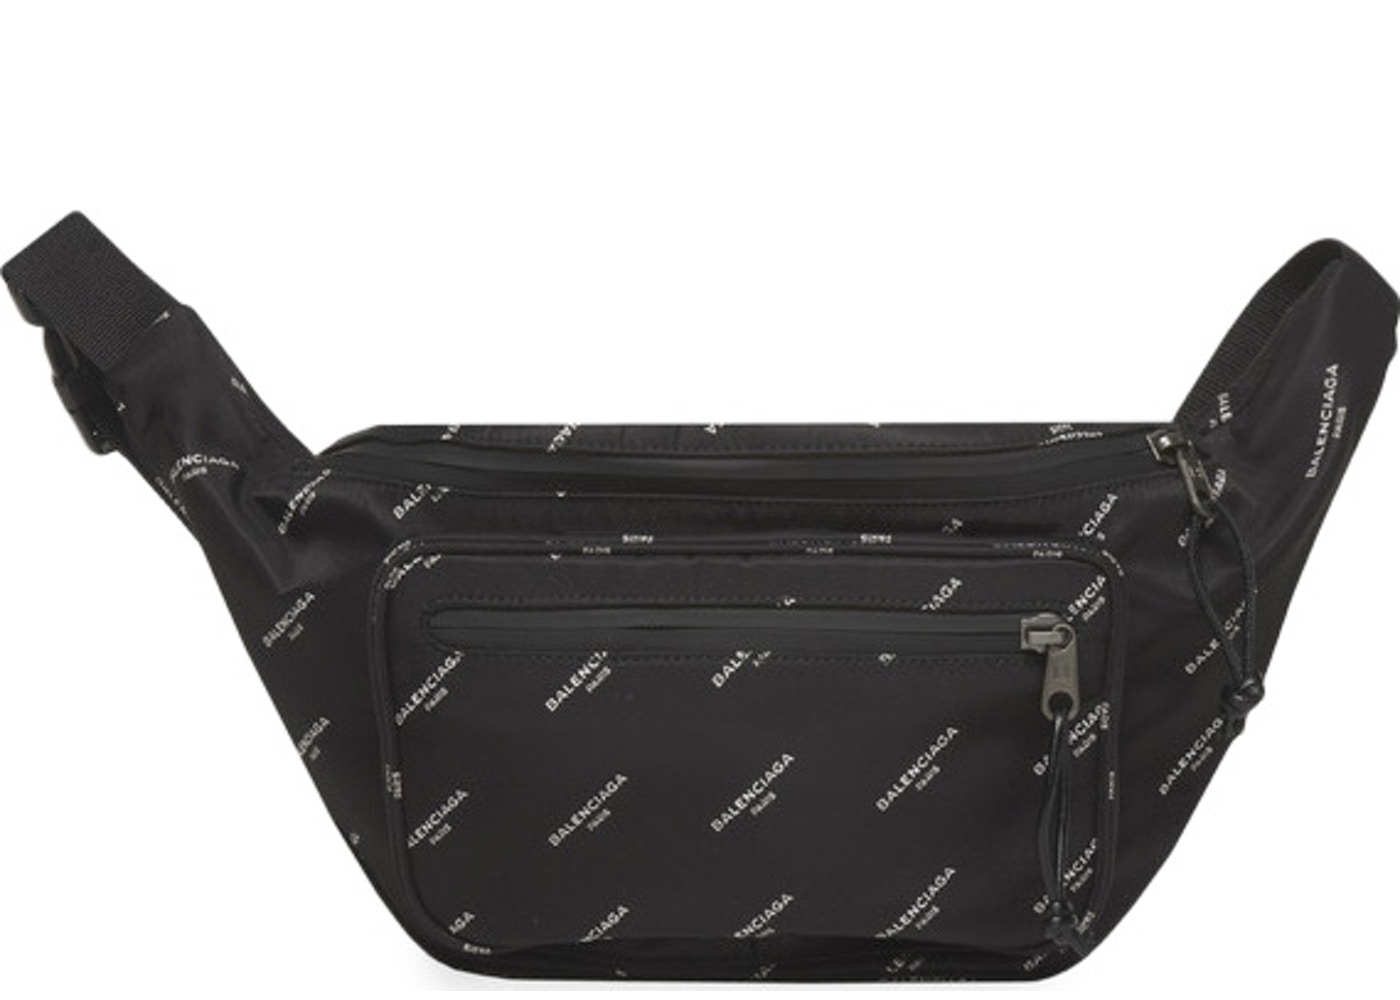 079cb3ab4591 Balenciaga Explorer Belt Bag Logos Black. Logos Black